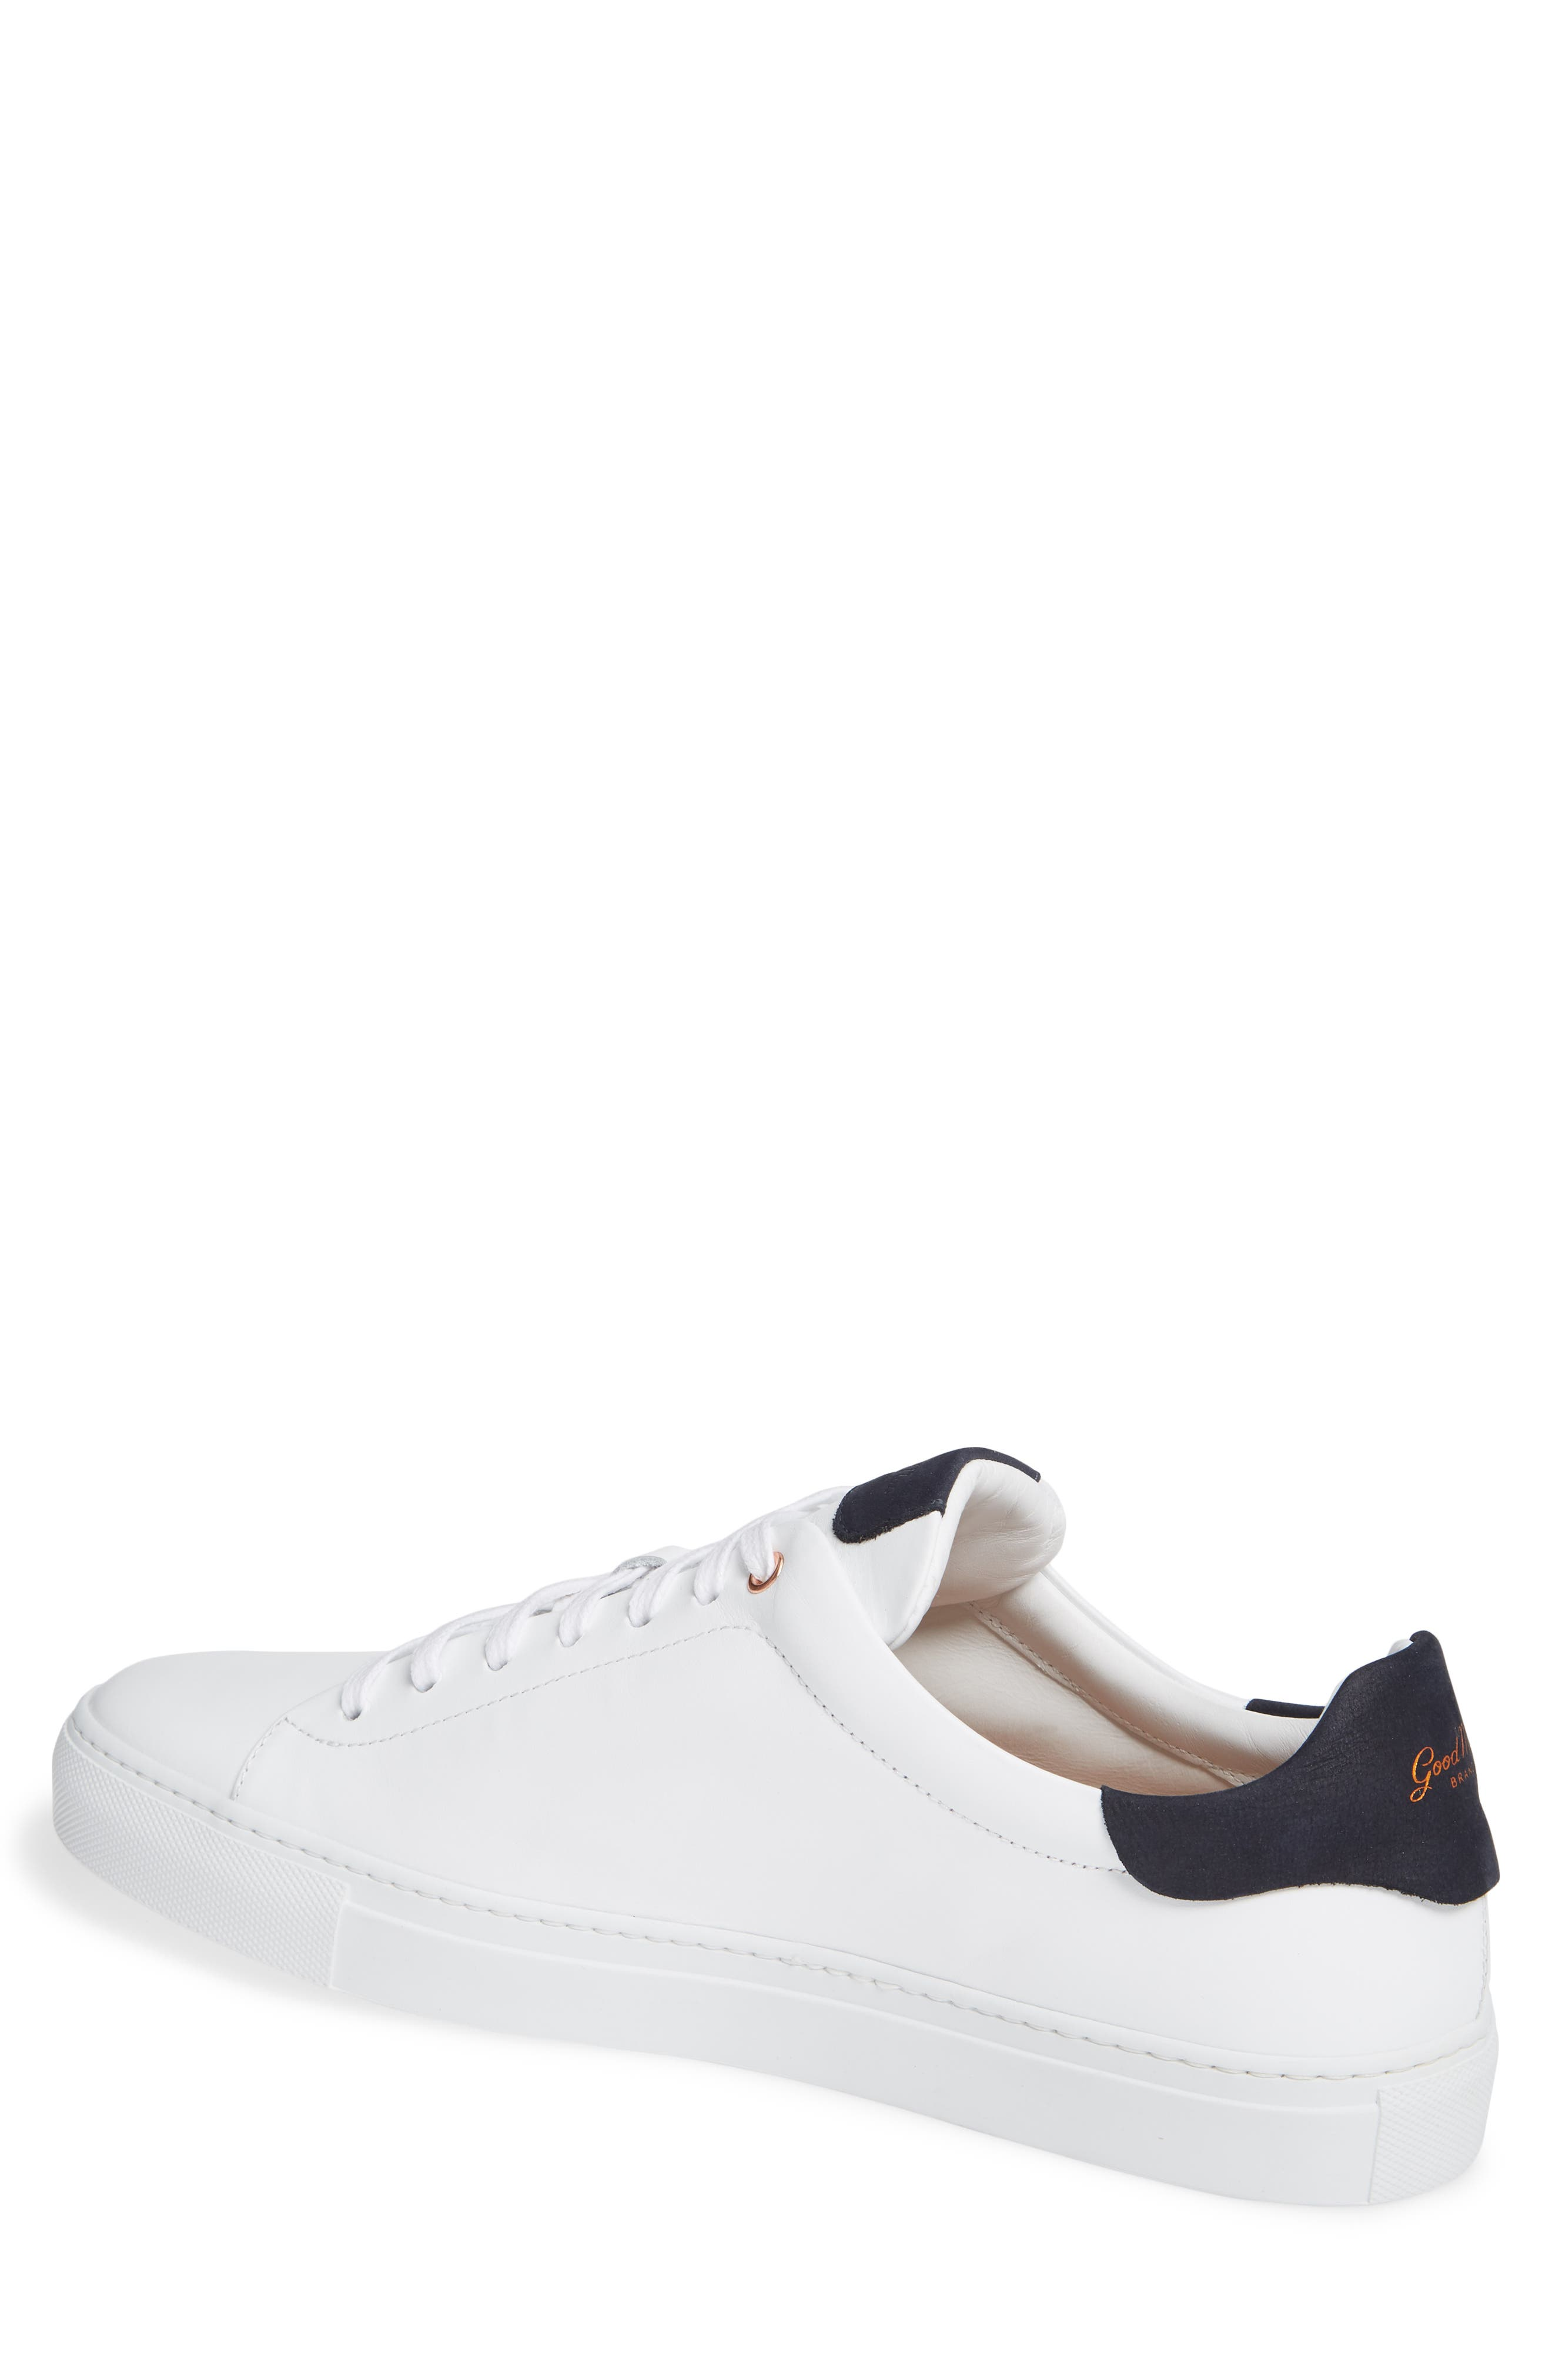 Legend Low Top Sneaker,                             Alternate thumbnail 2, color,                             White / Indigo Nubuck